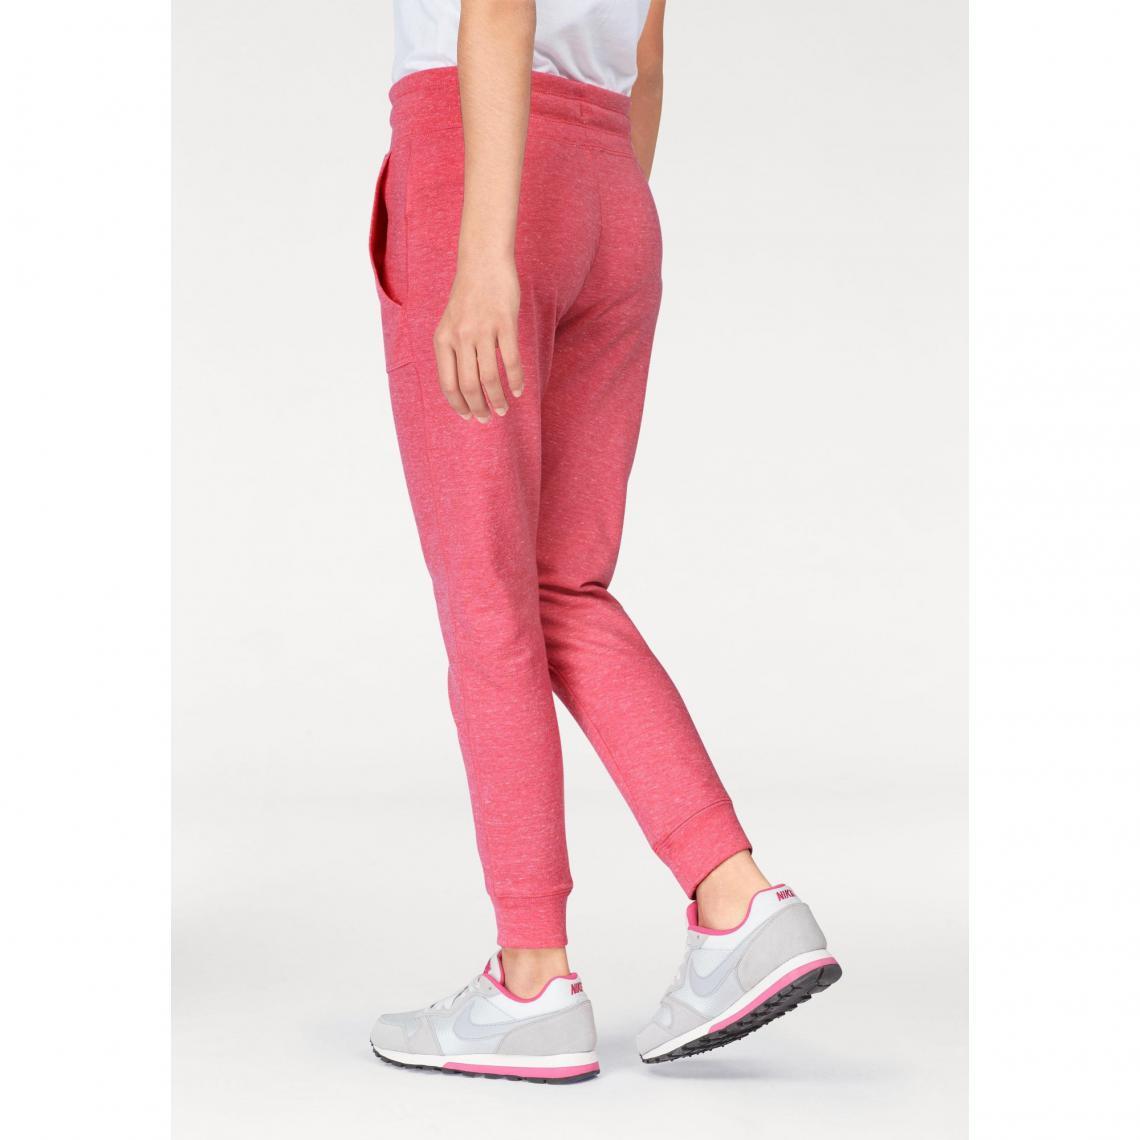 Pantalon de jogging Nike Sportswear Gym Vintage junior fille ... 8adb76b9356